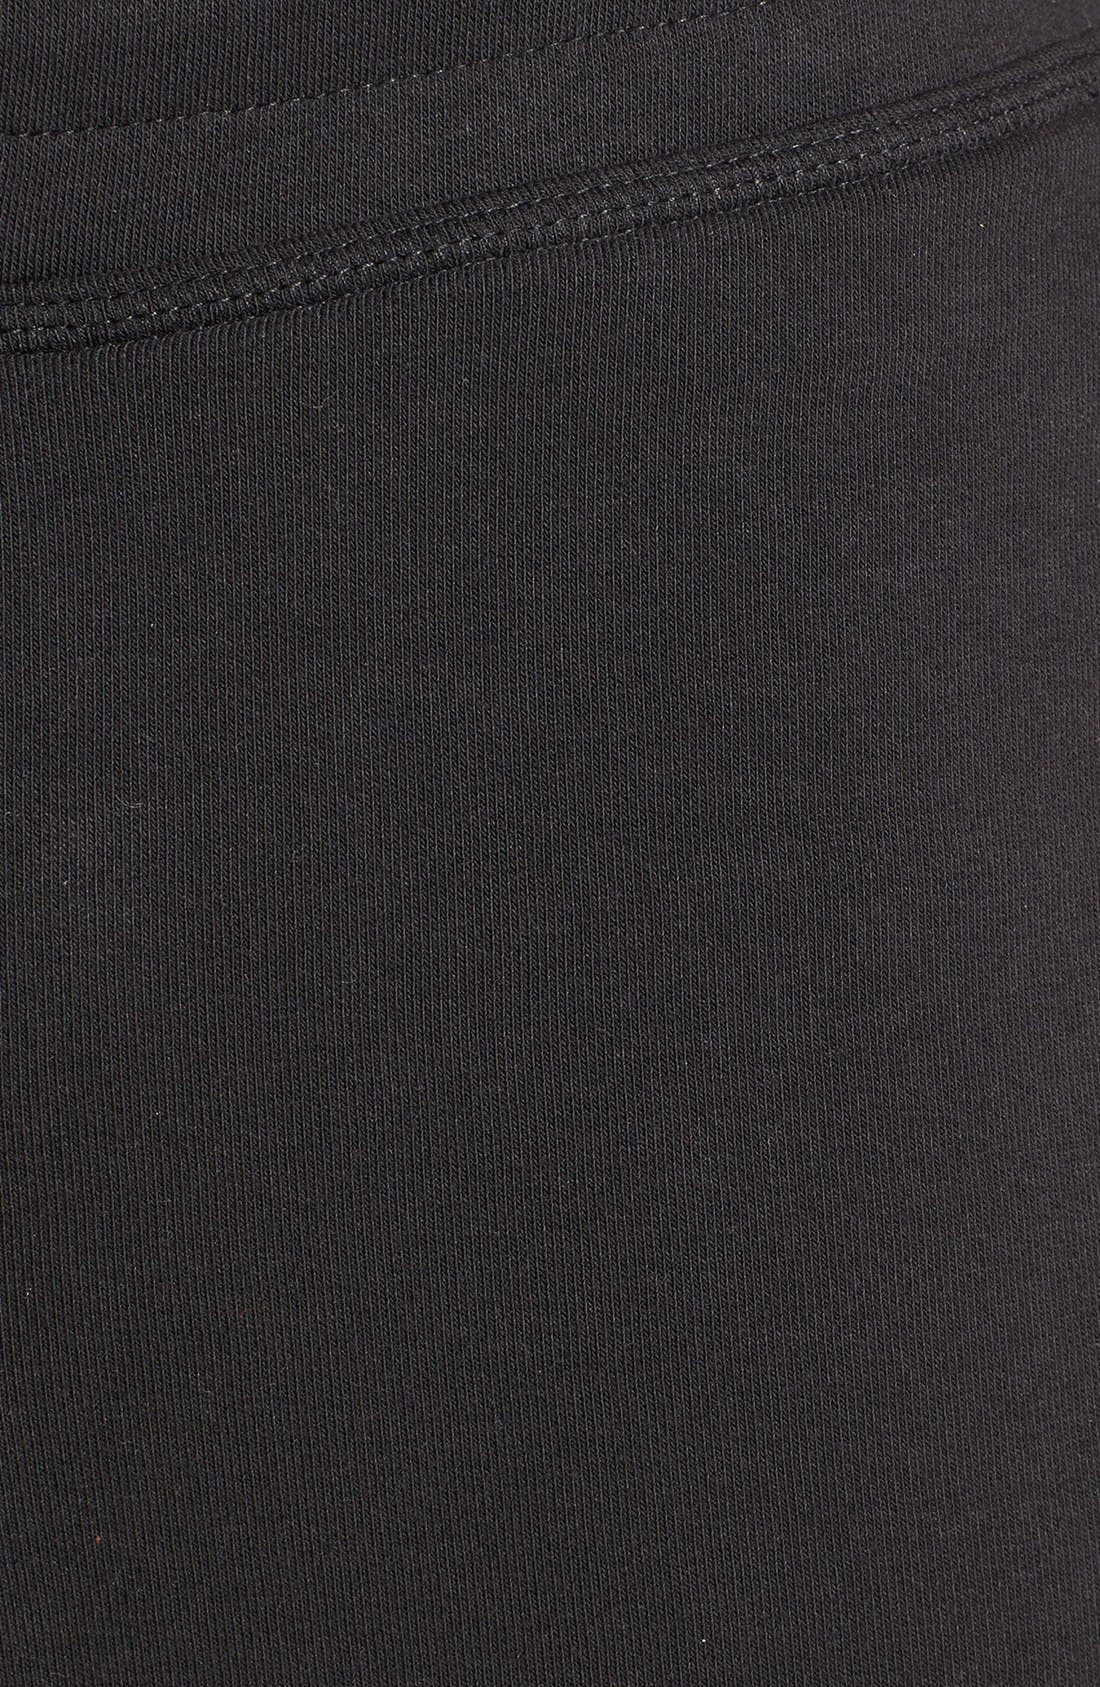 Alternate Image 3  - Topman Jogger Sweatpants